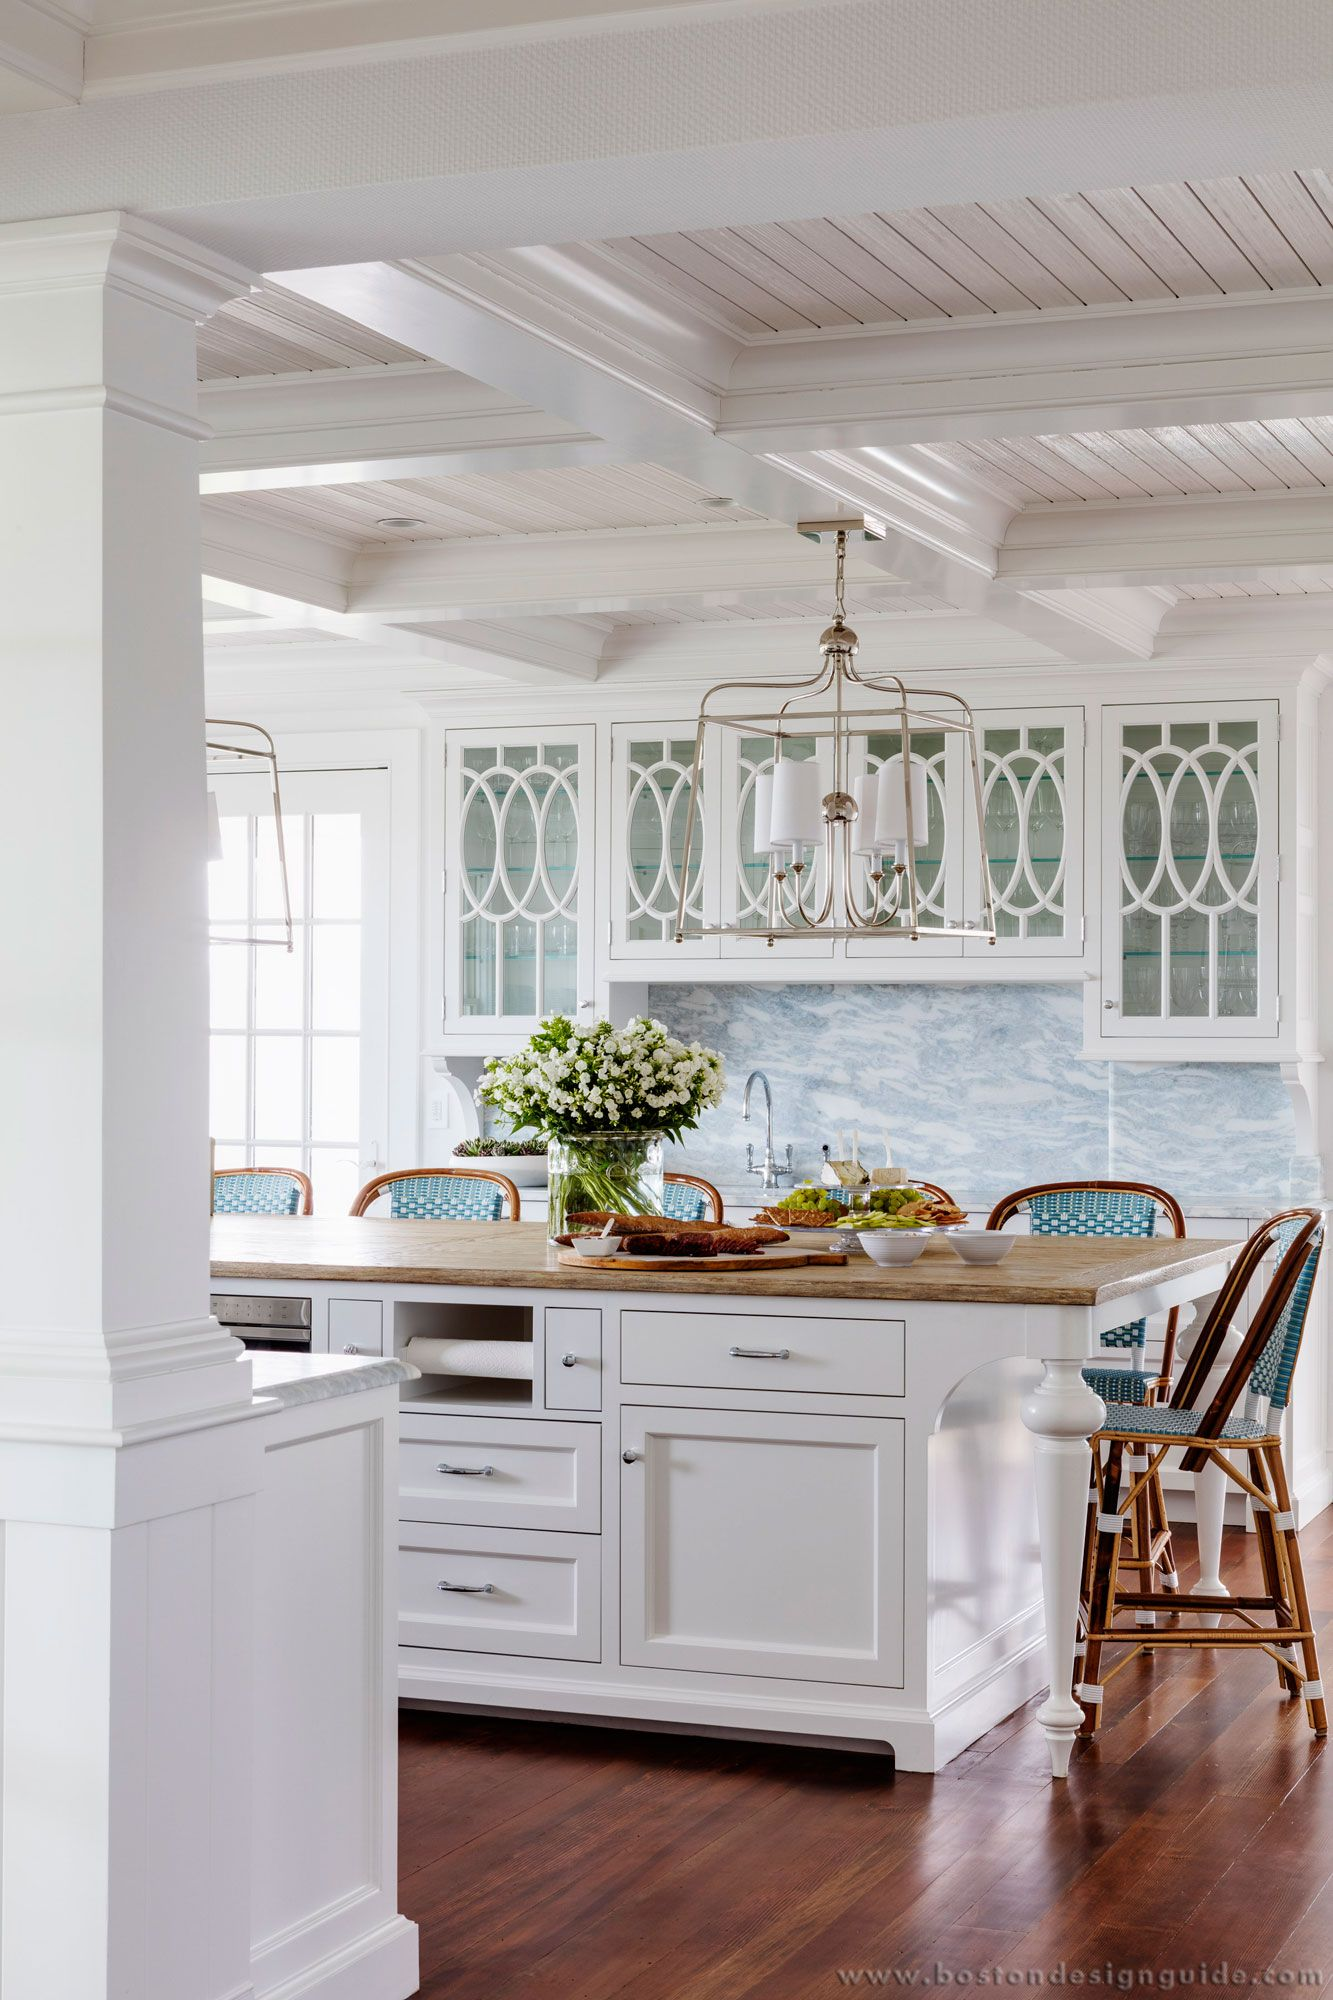 593 best Kitchens images on Pinterest